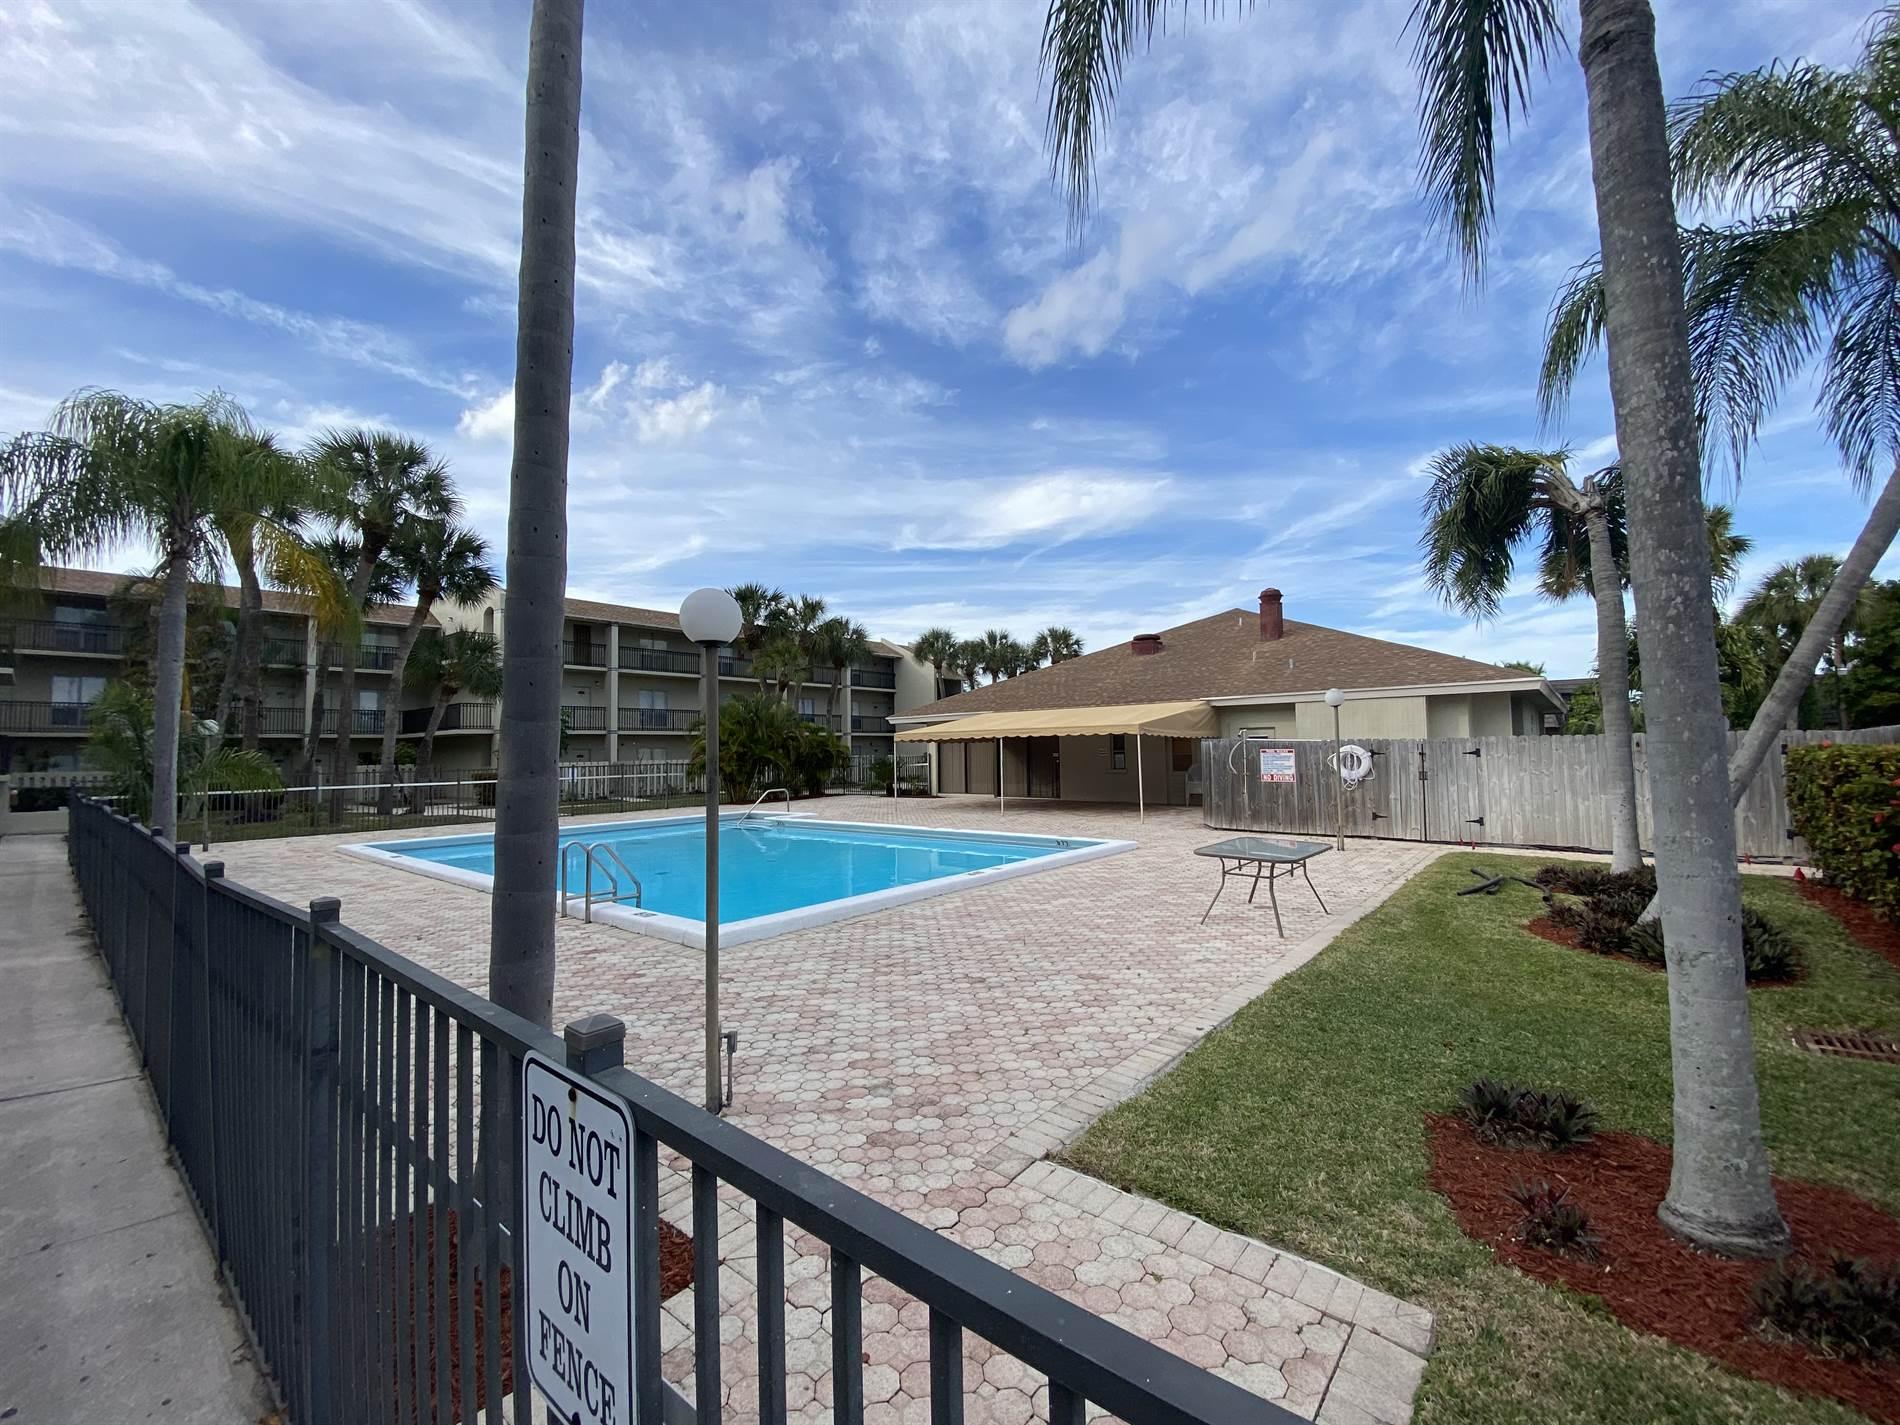 1500 North Congress Avenue, #B30, West Palm Beach, FL 33401